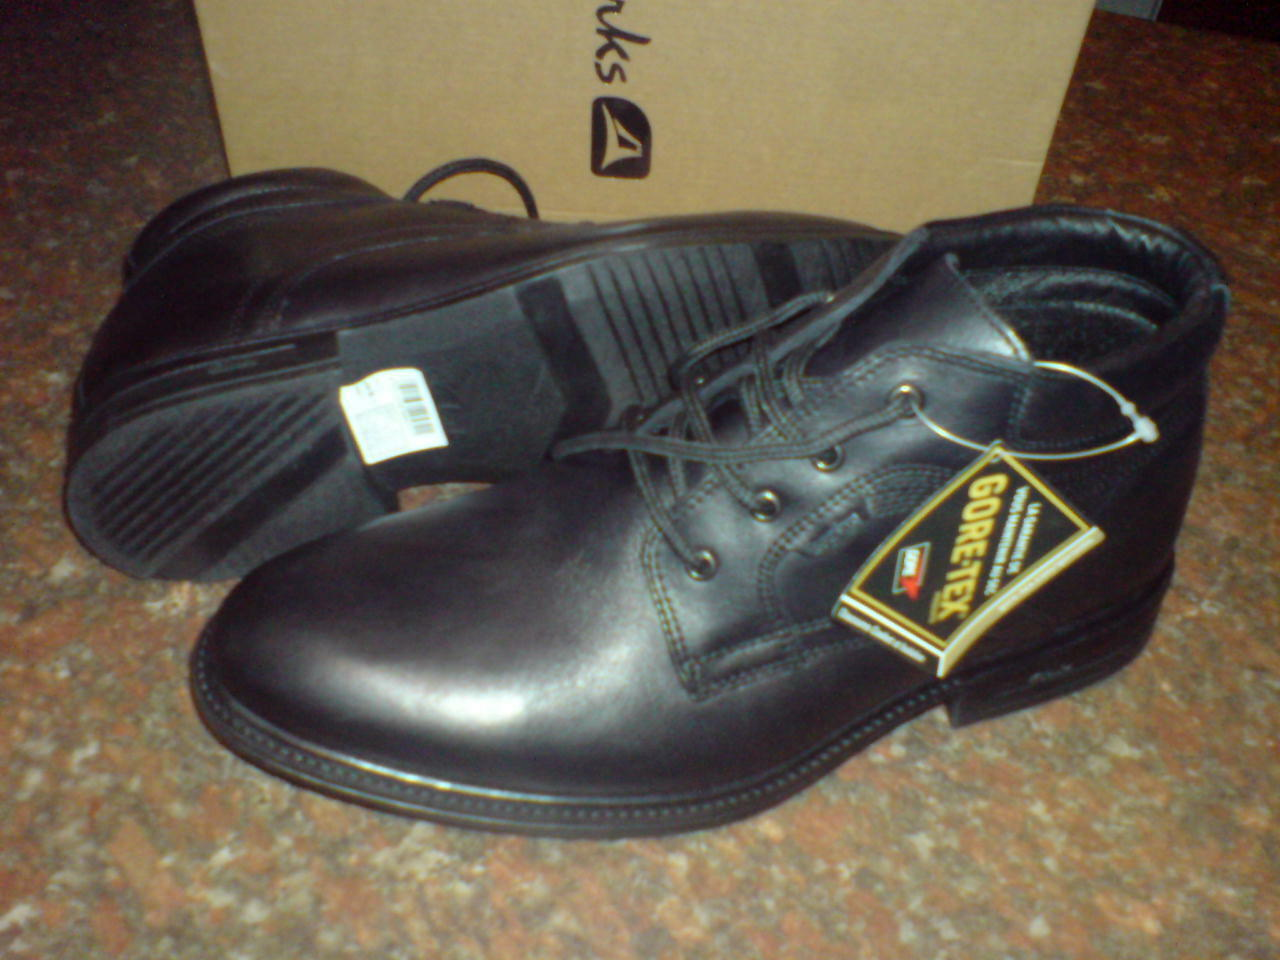 New Clarks MEN FALL PROOF GTX  WARM LINING&SOCK BOOT BLACK LEATHER  UK 7.5